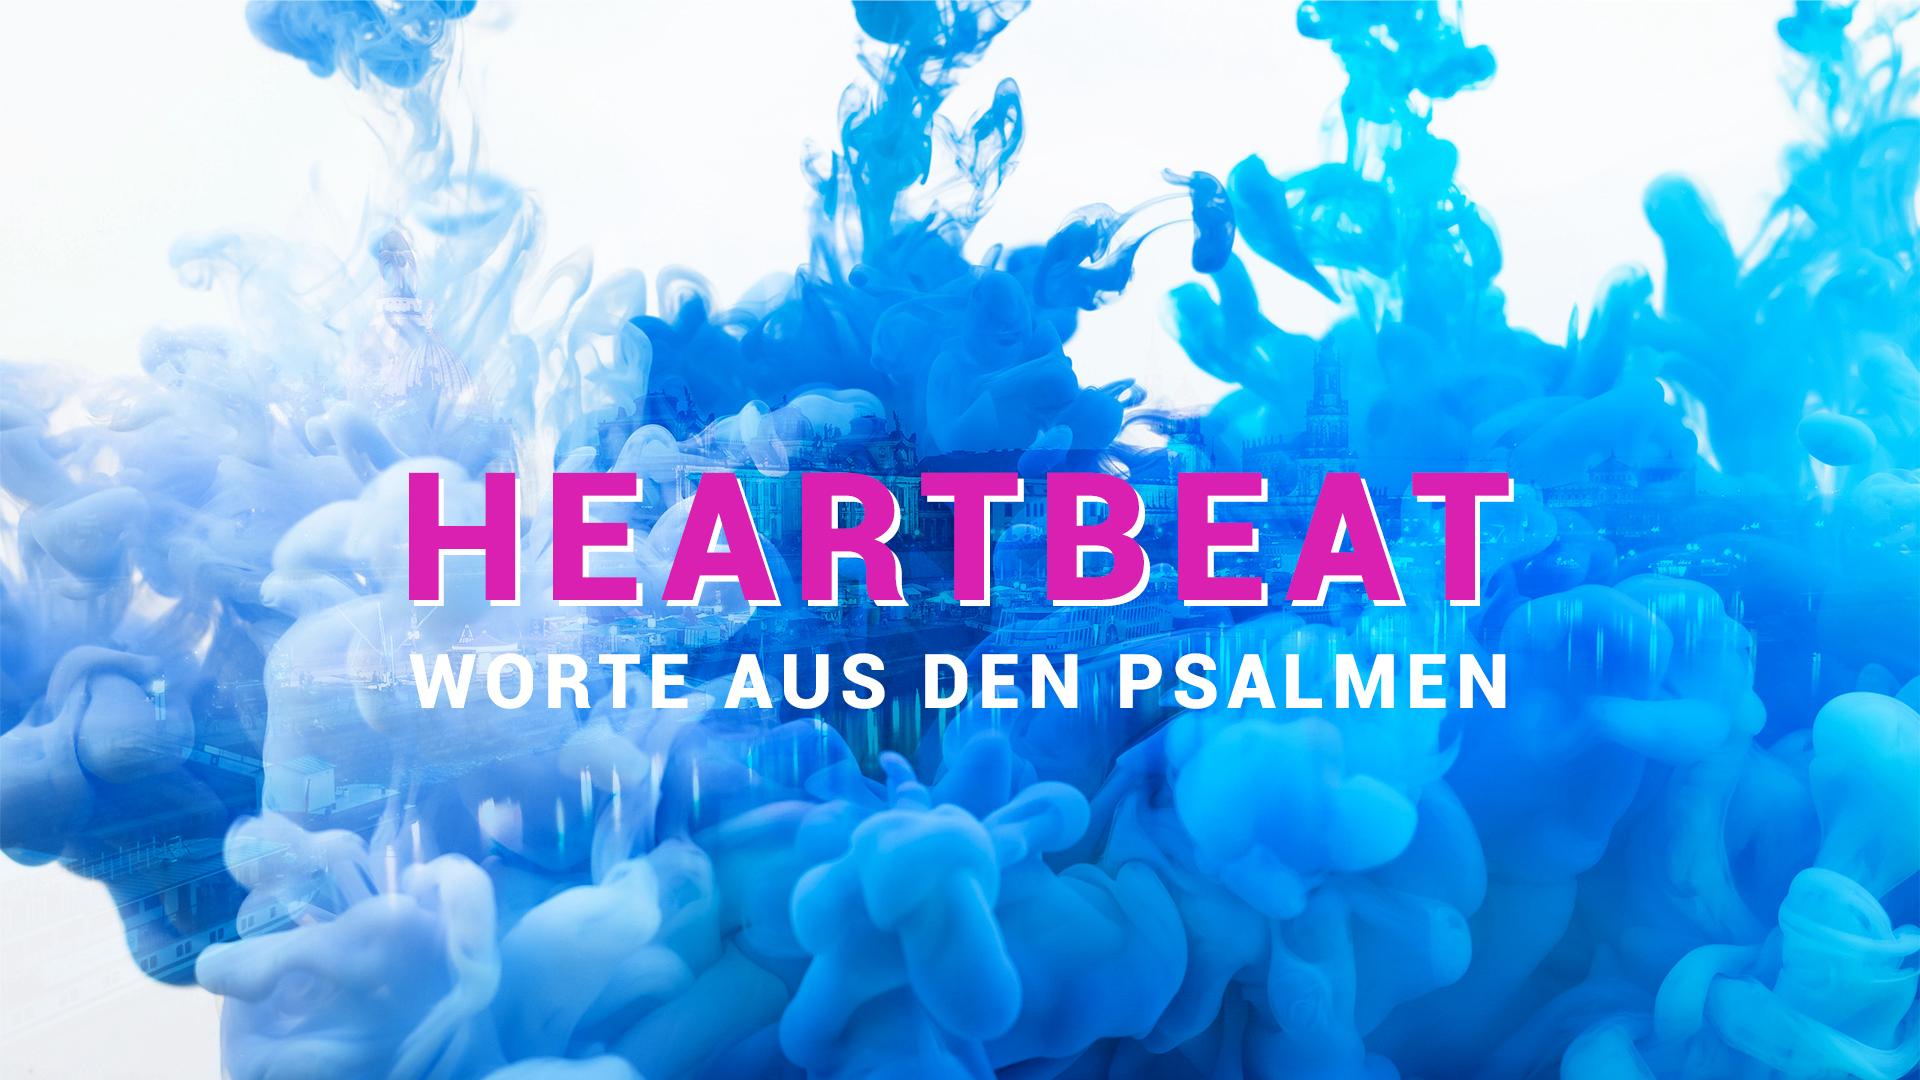 Heartbeat - Worte aus den Psalmen Teil 1 [video]